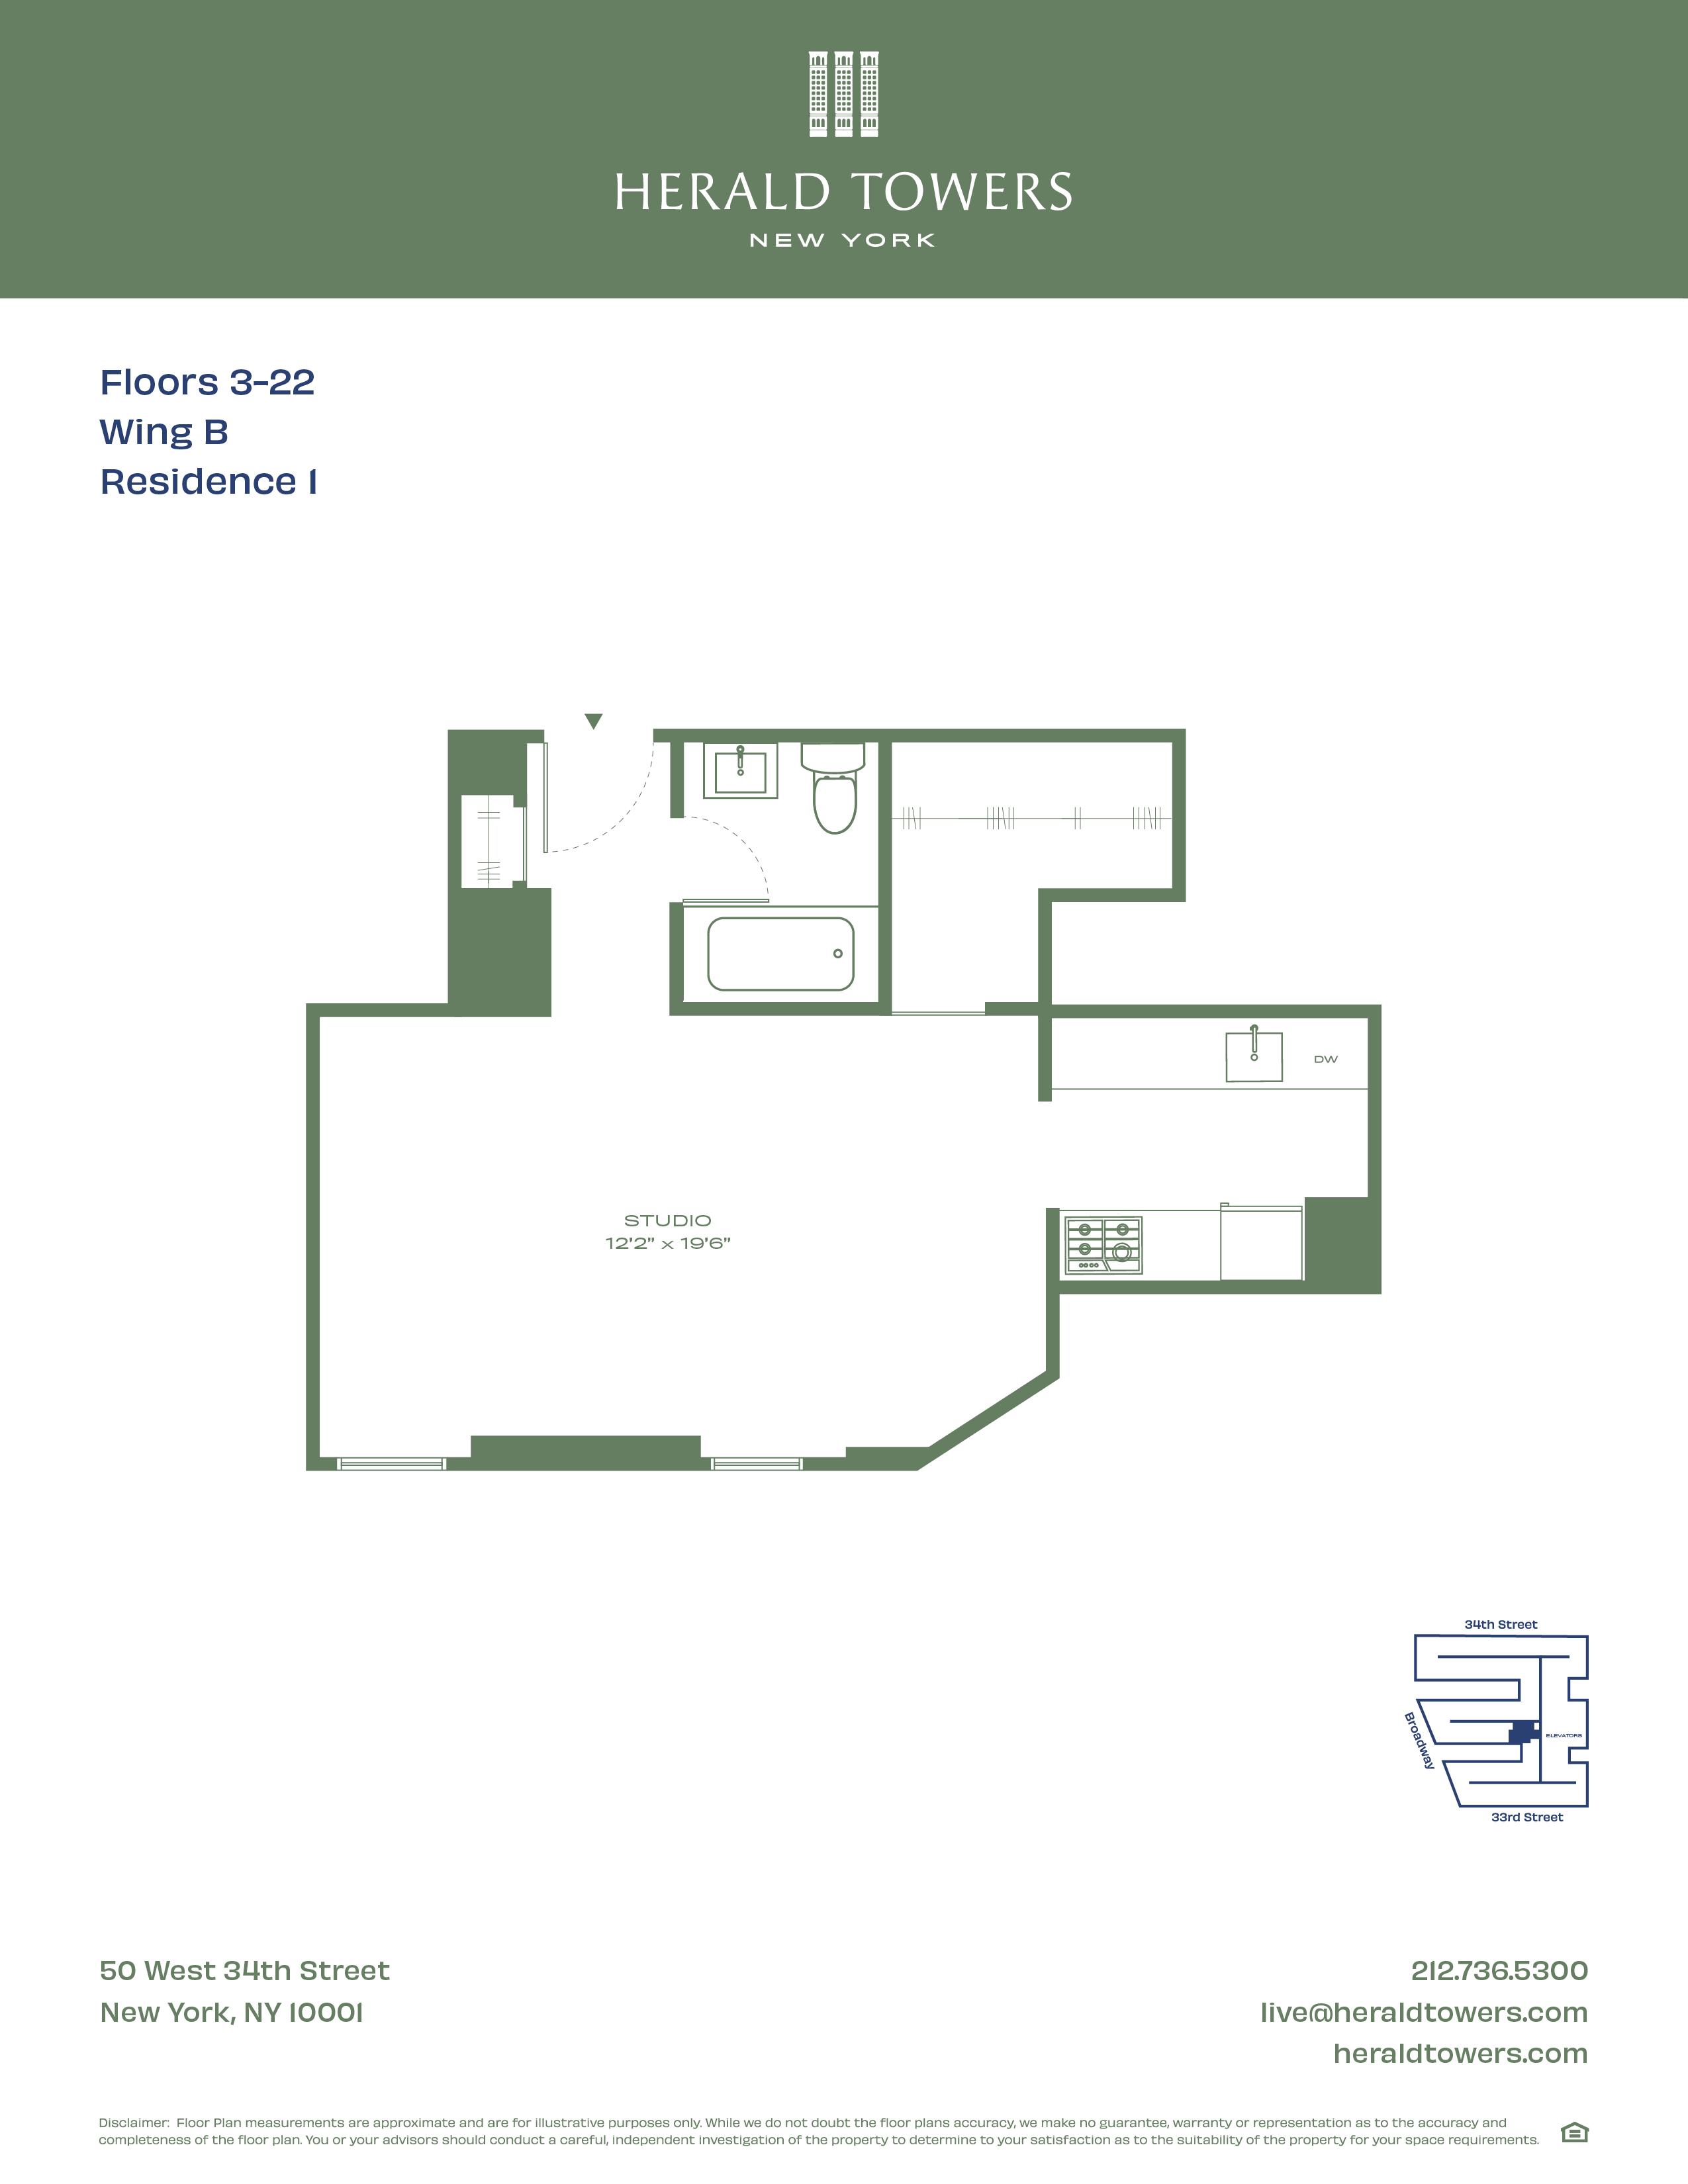 Floor plan for 14B01